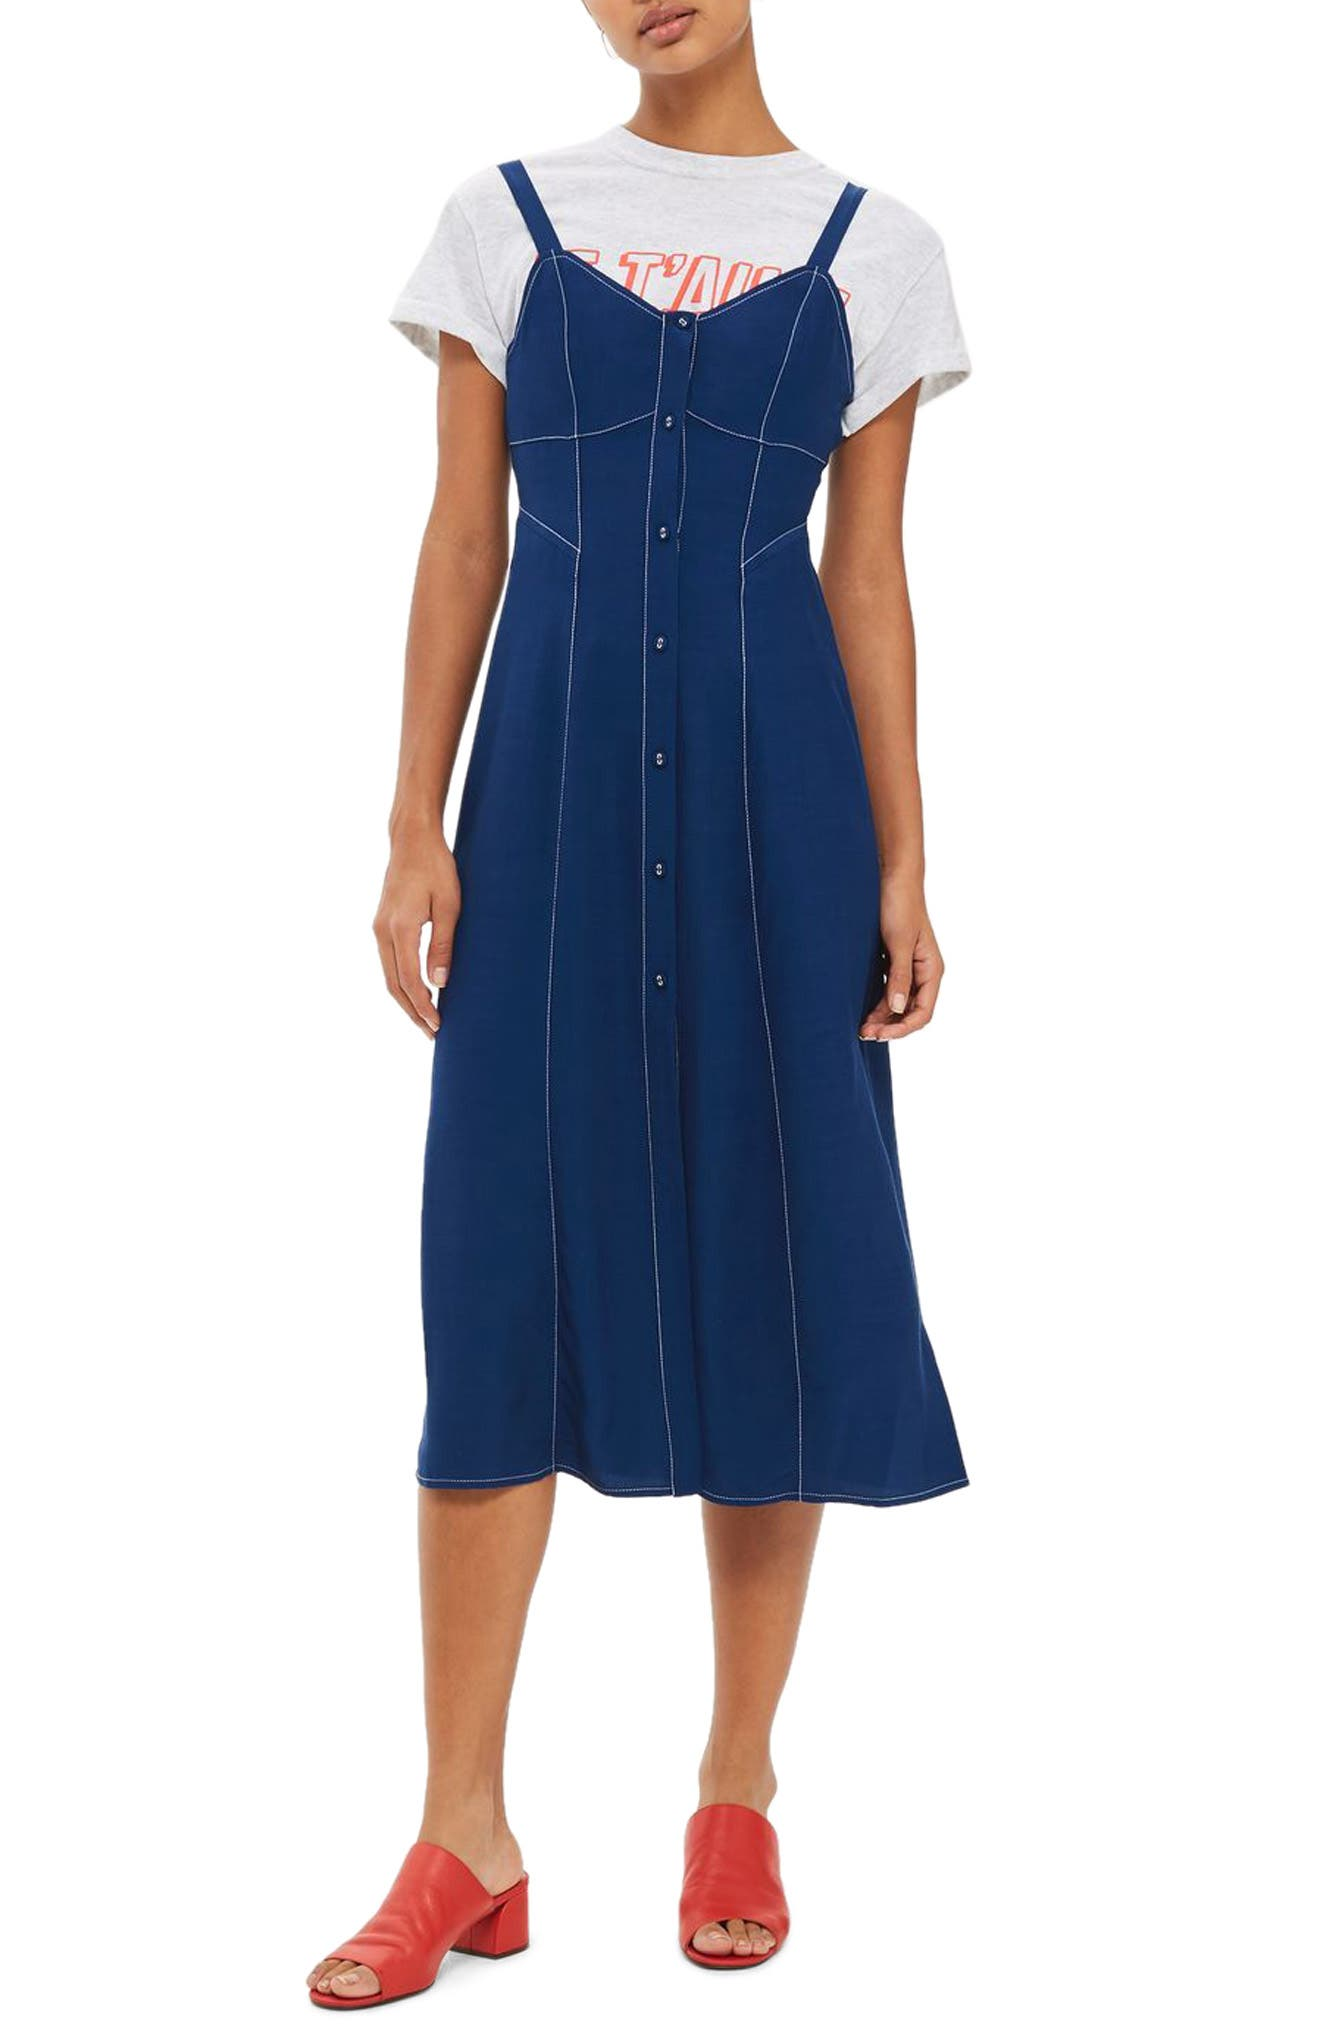 Alternate Image 1 Selected - Topshop Topstitch Corset Midi Dress